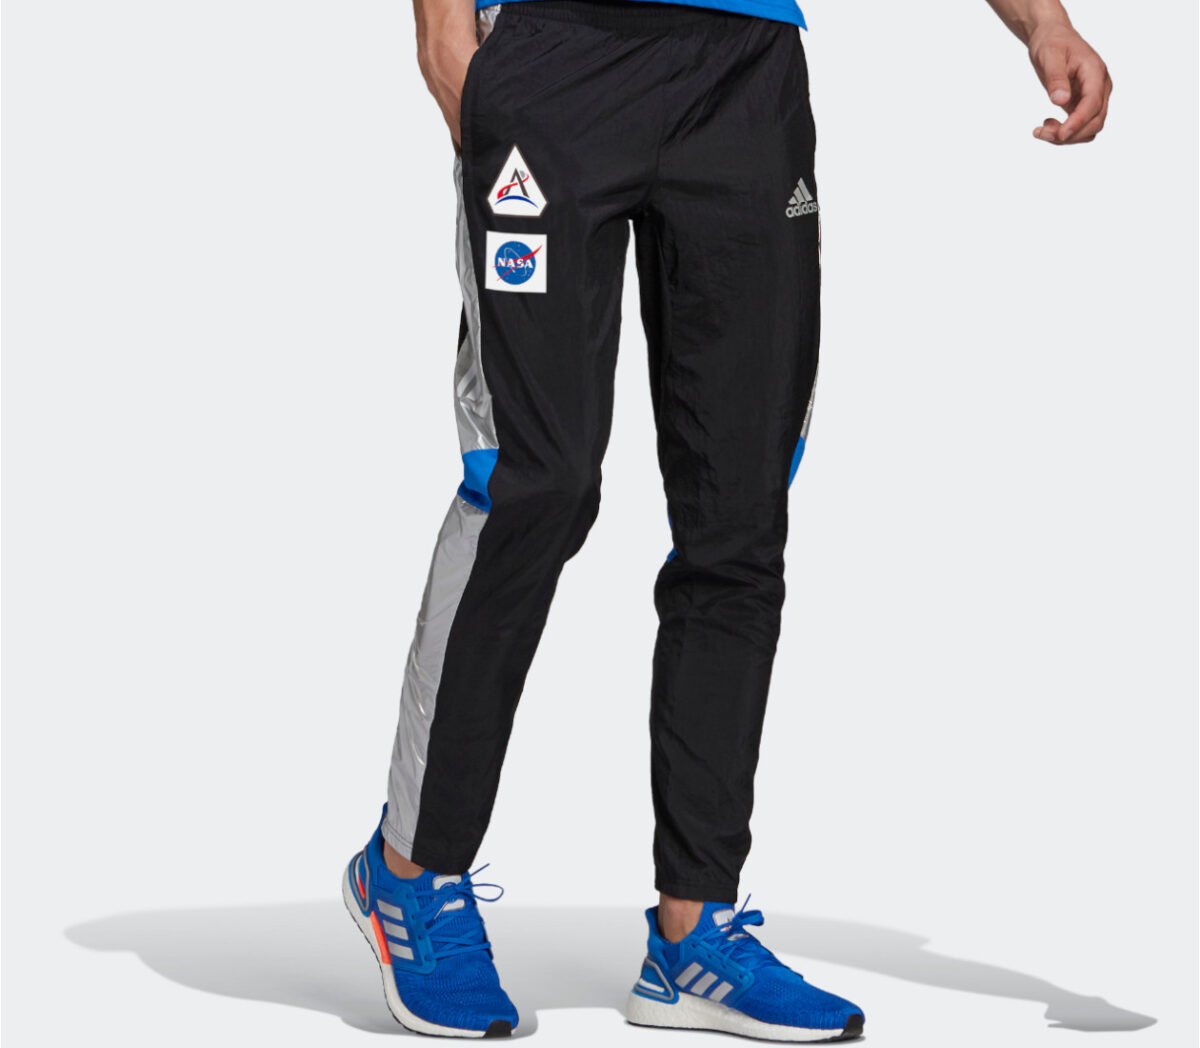 pantaloni da allenamento uomo adidas nasa